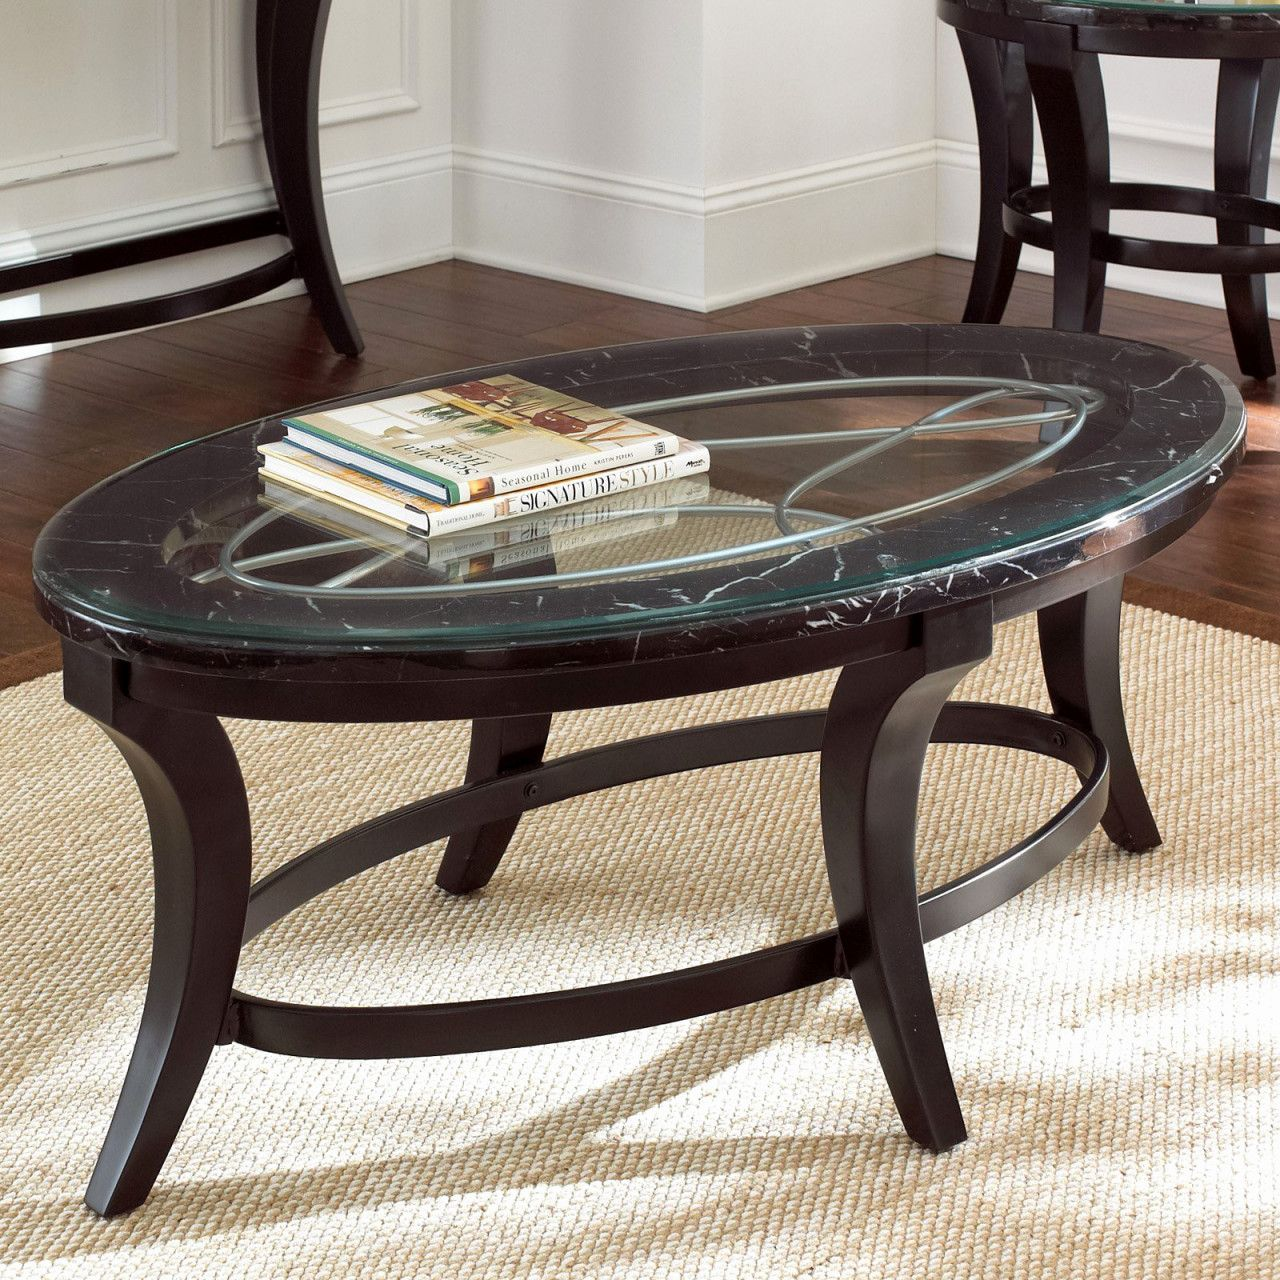 20 Elegant Coffee And End Tables Walmart 2019 Coffee Table Walmart Granite Coffee Table Silver Coffee Table [ 1280 x 1280 Pixel ]